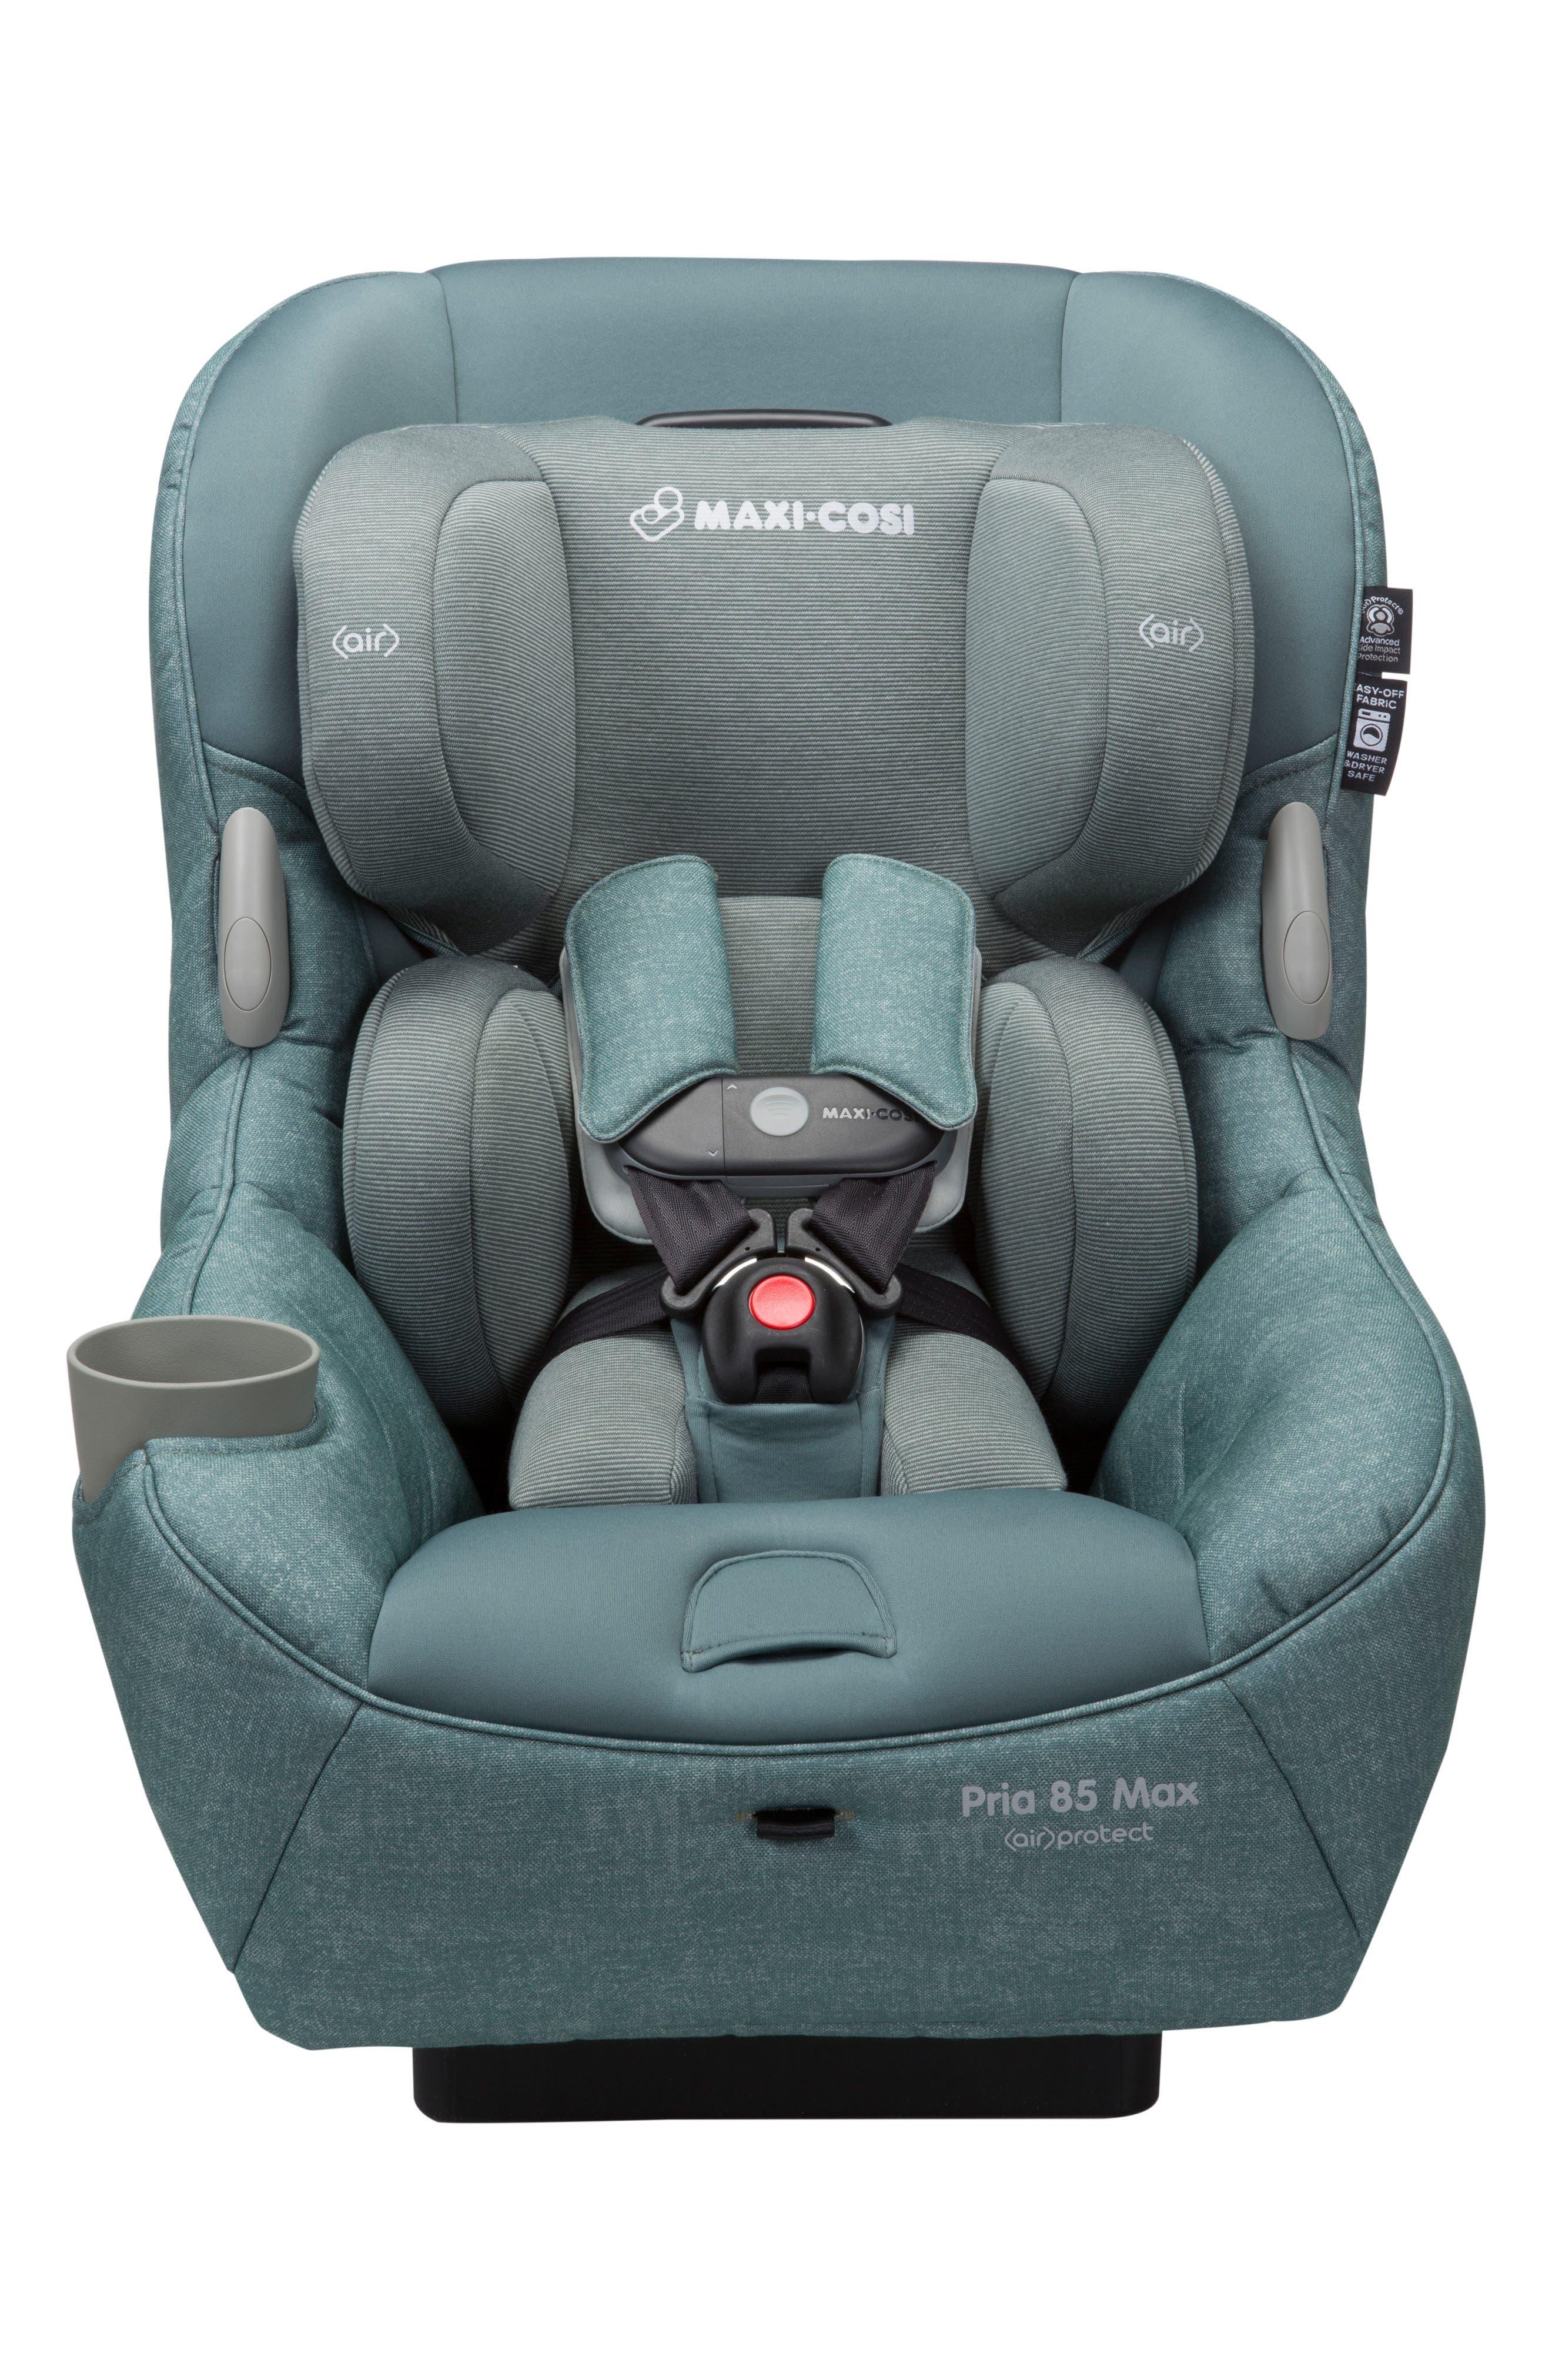 Main Image - Maxi-Cosi® Pria™ 85 Max Nomad Collection Convertible Car Seat